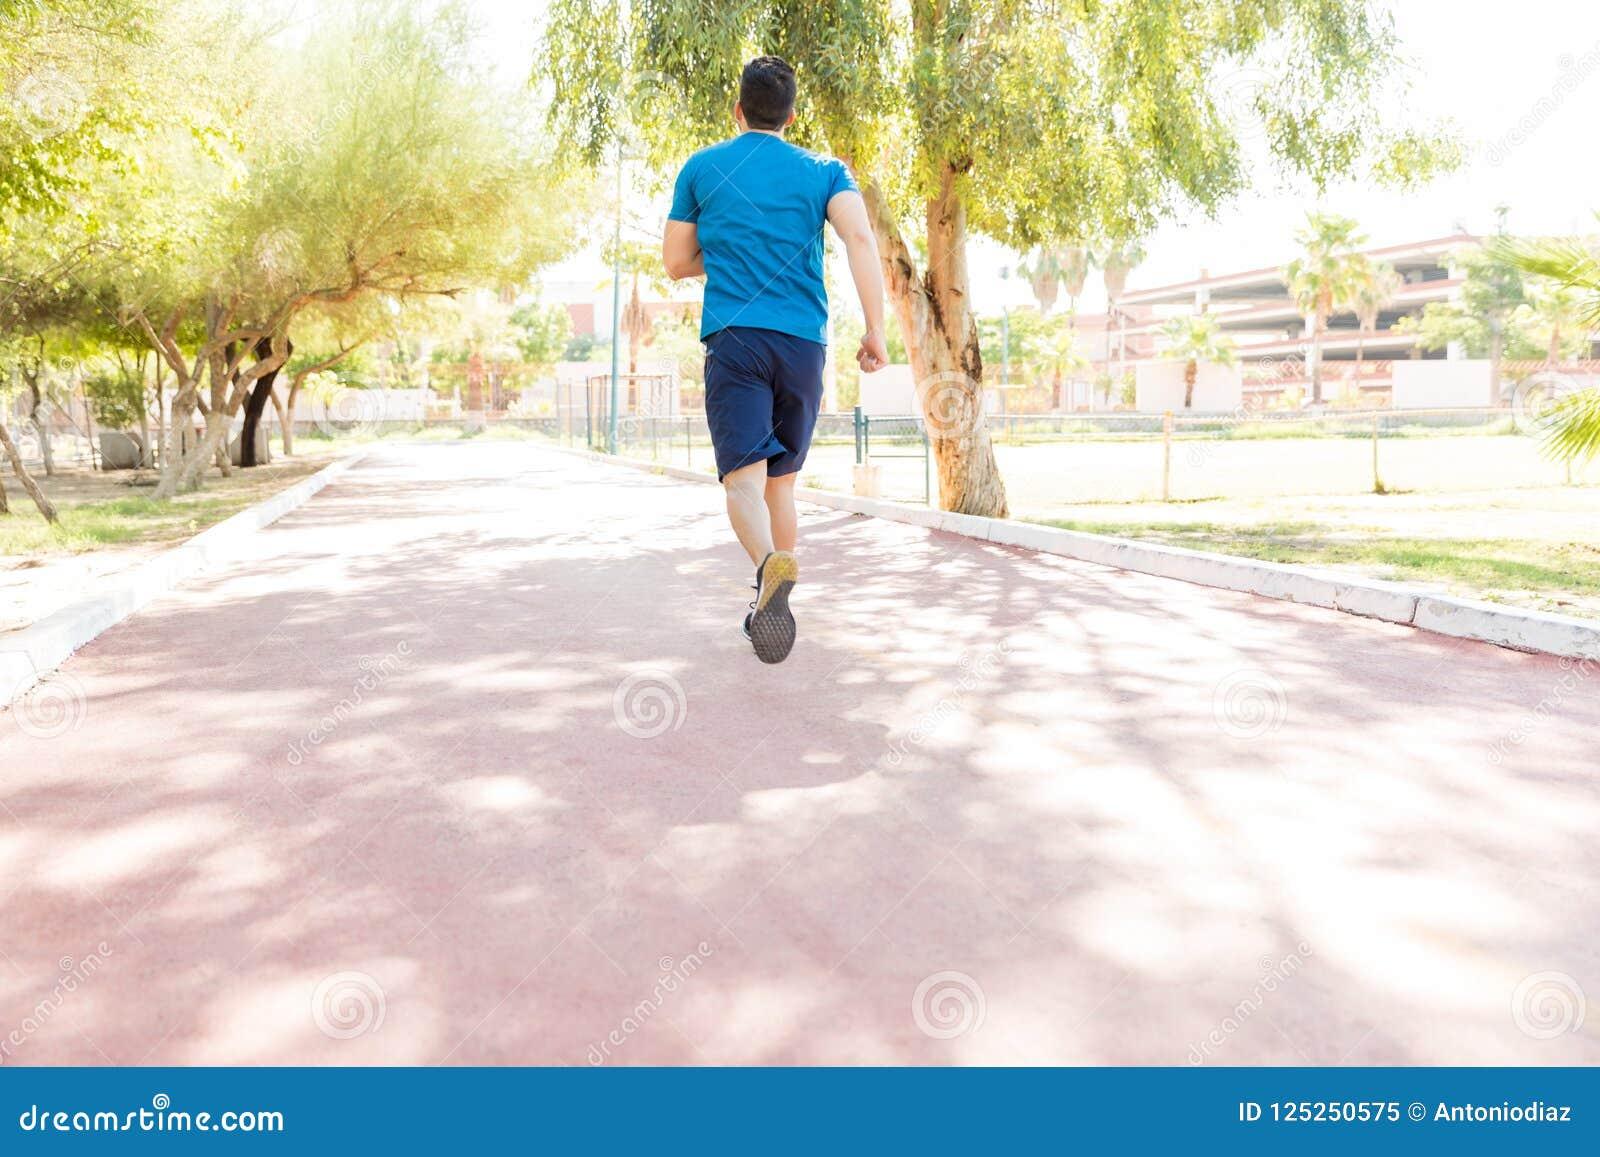 Atleta masculino Sprinting On Road no parque